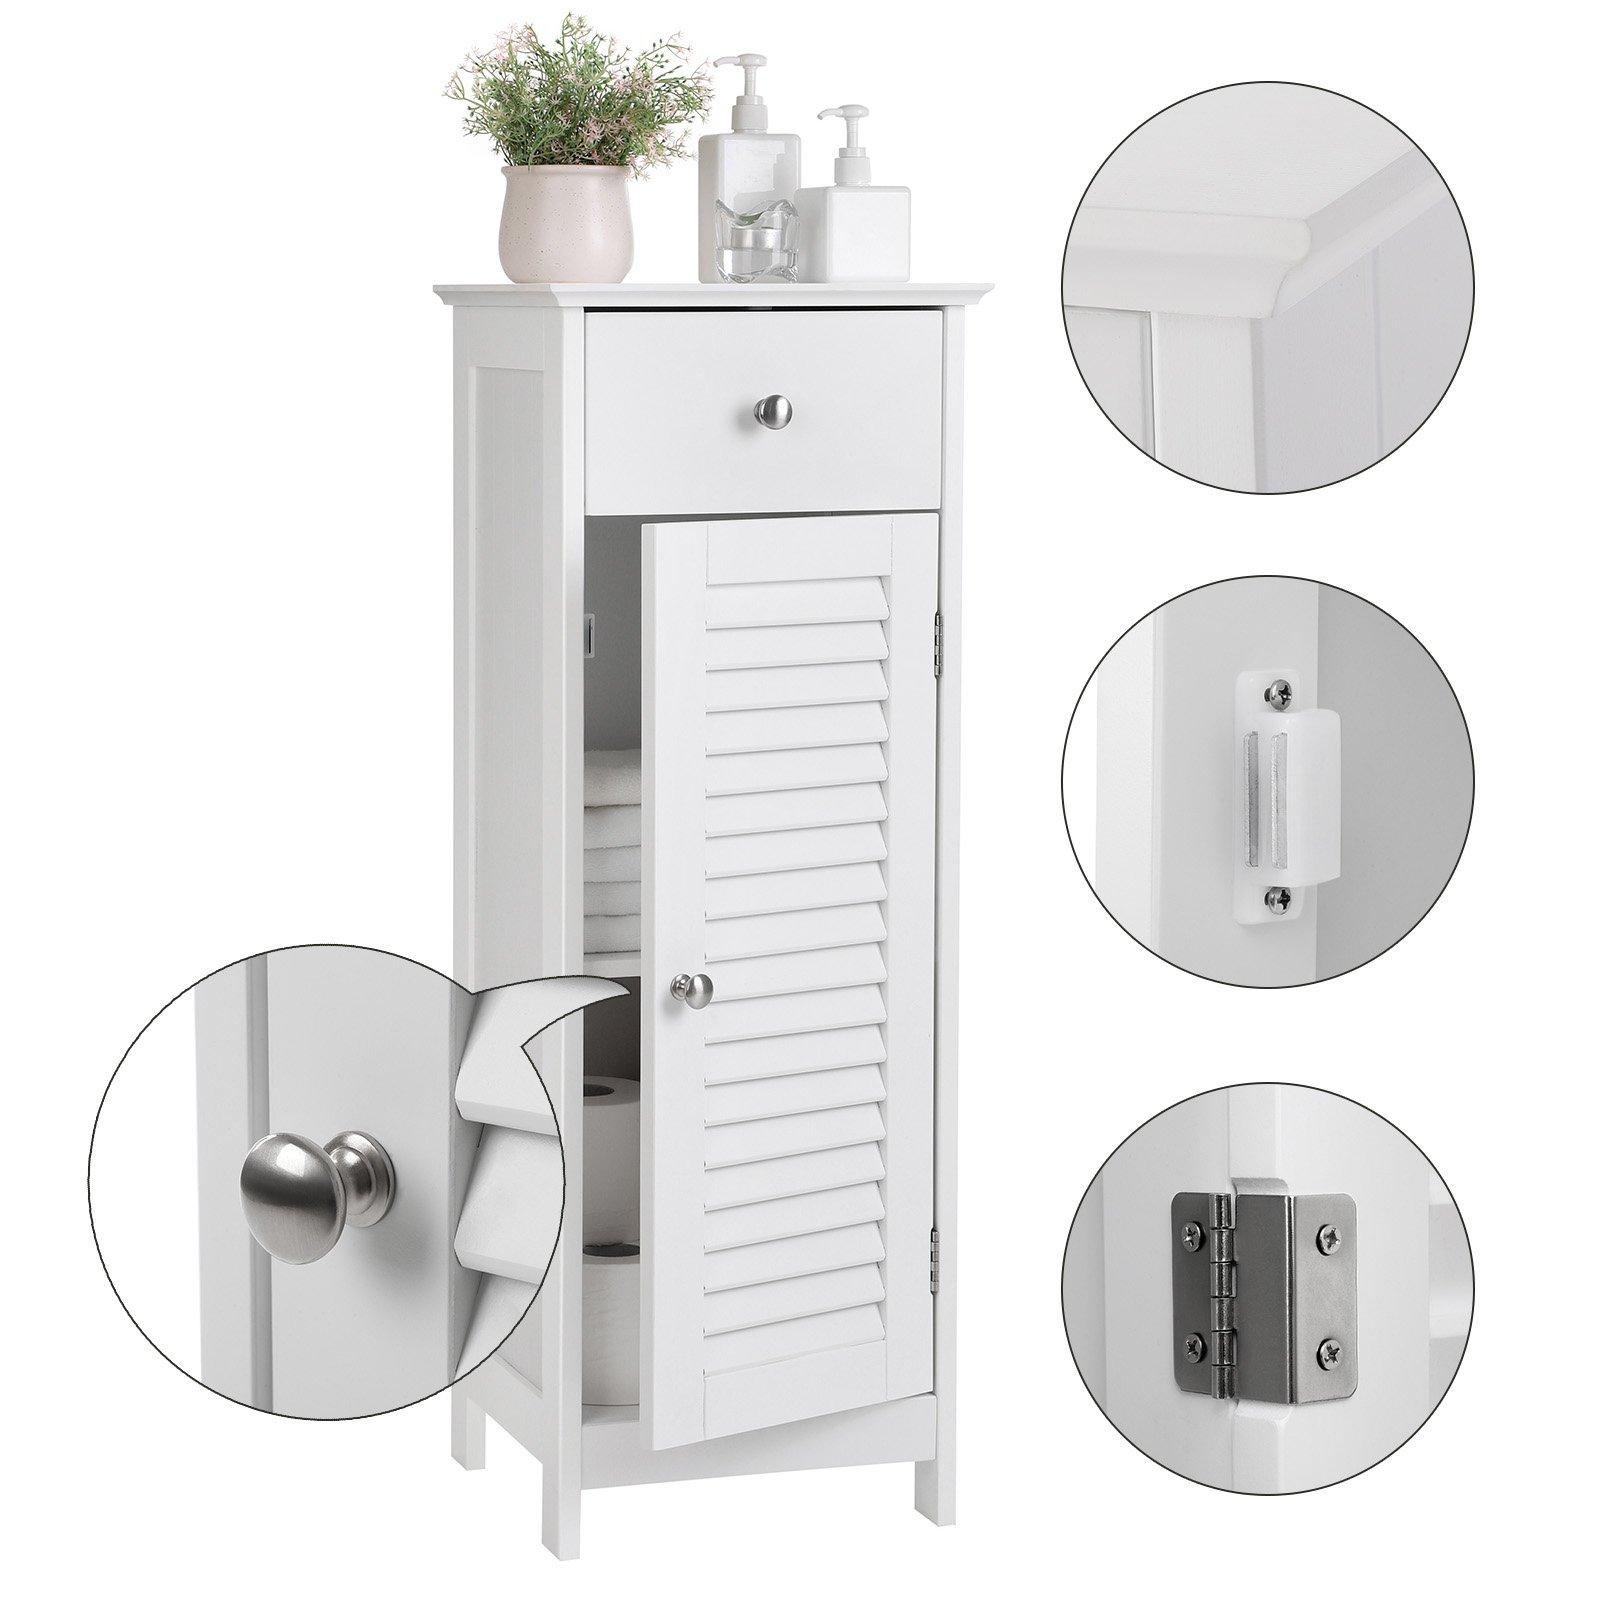 Bathroom Floor Cabinet Storage Organizer Set Free Standing with Drawer and Door